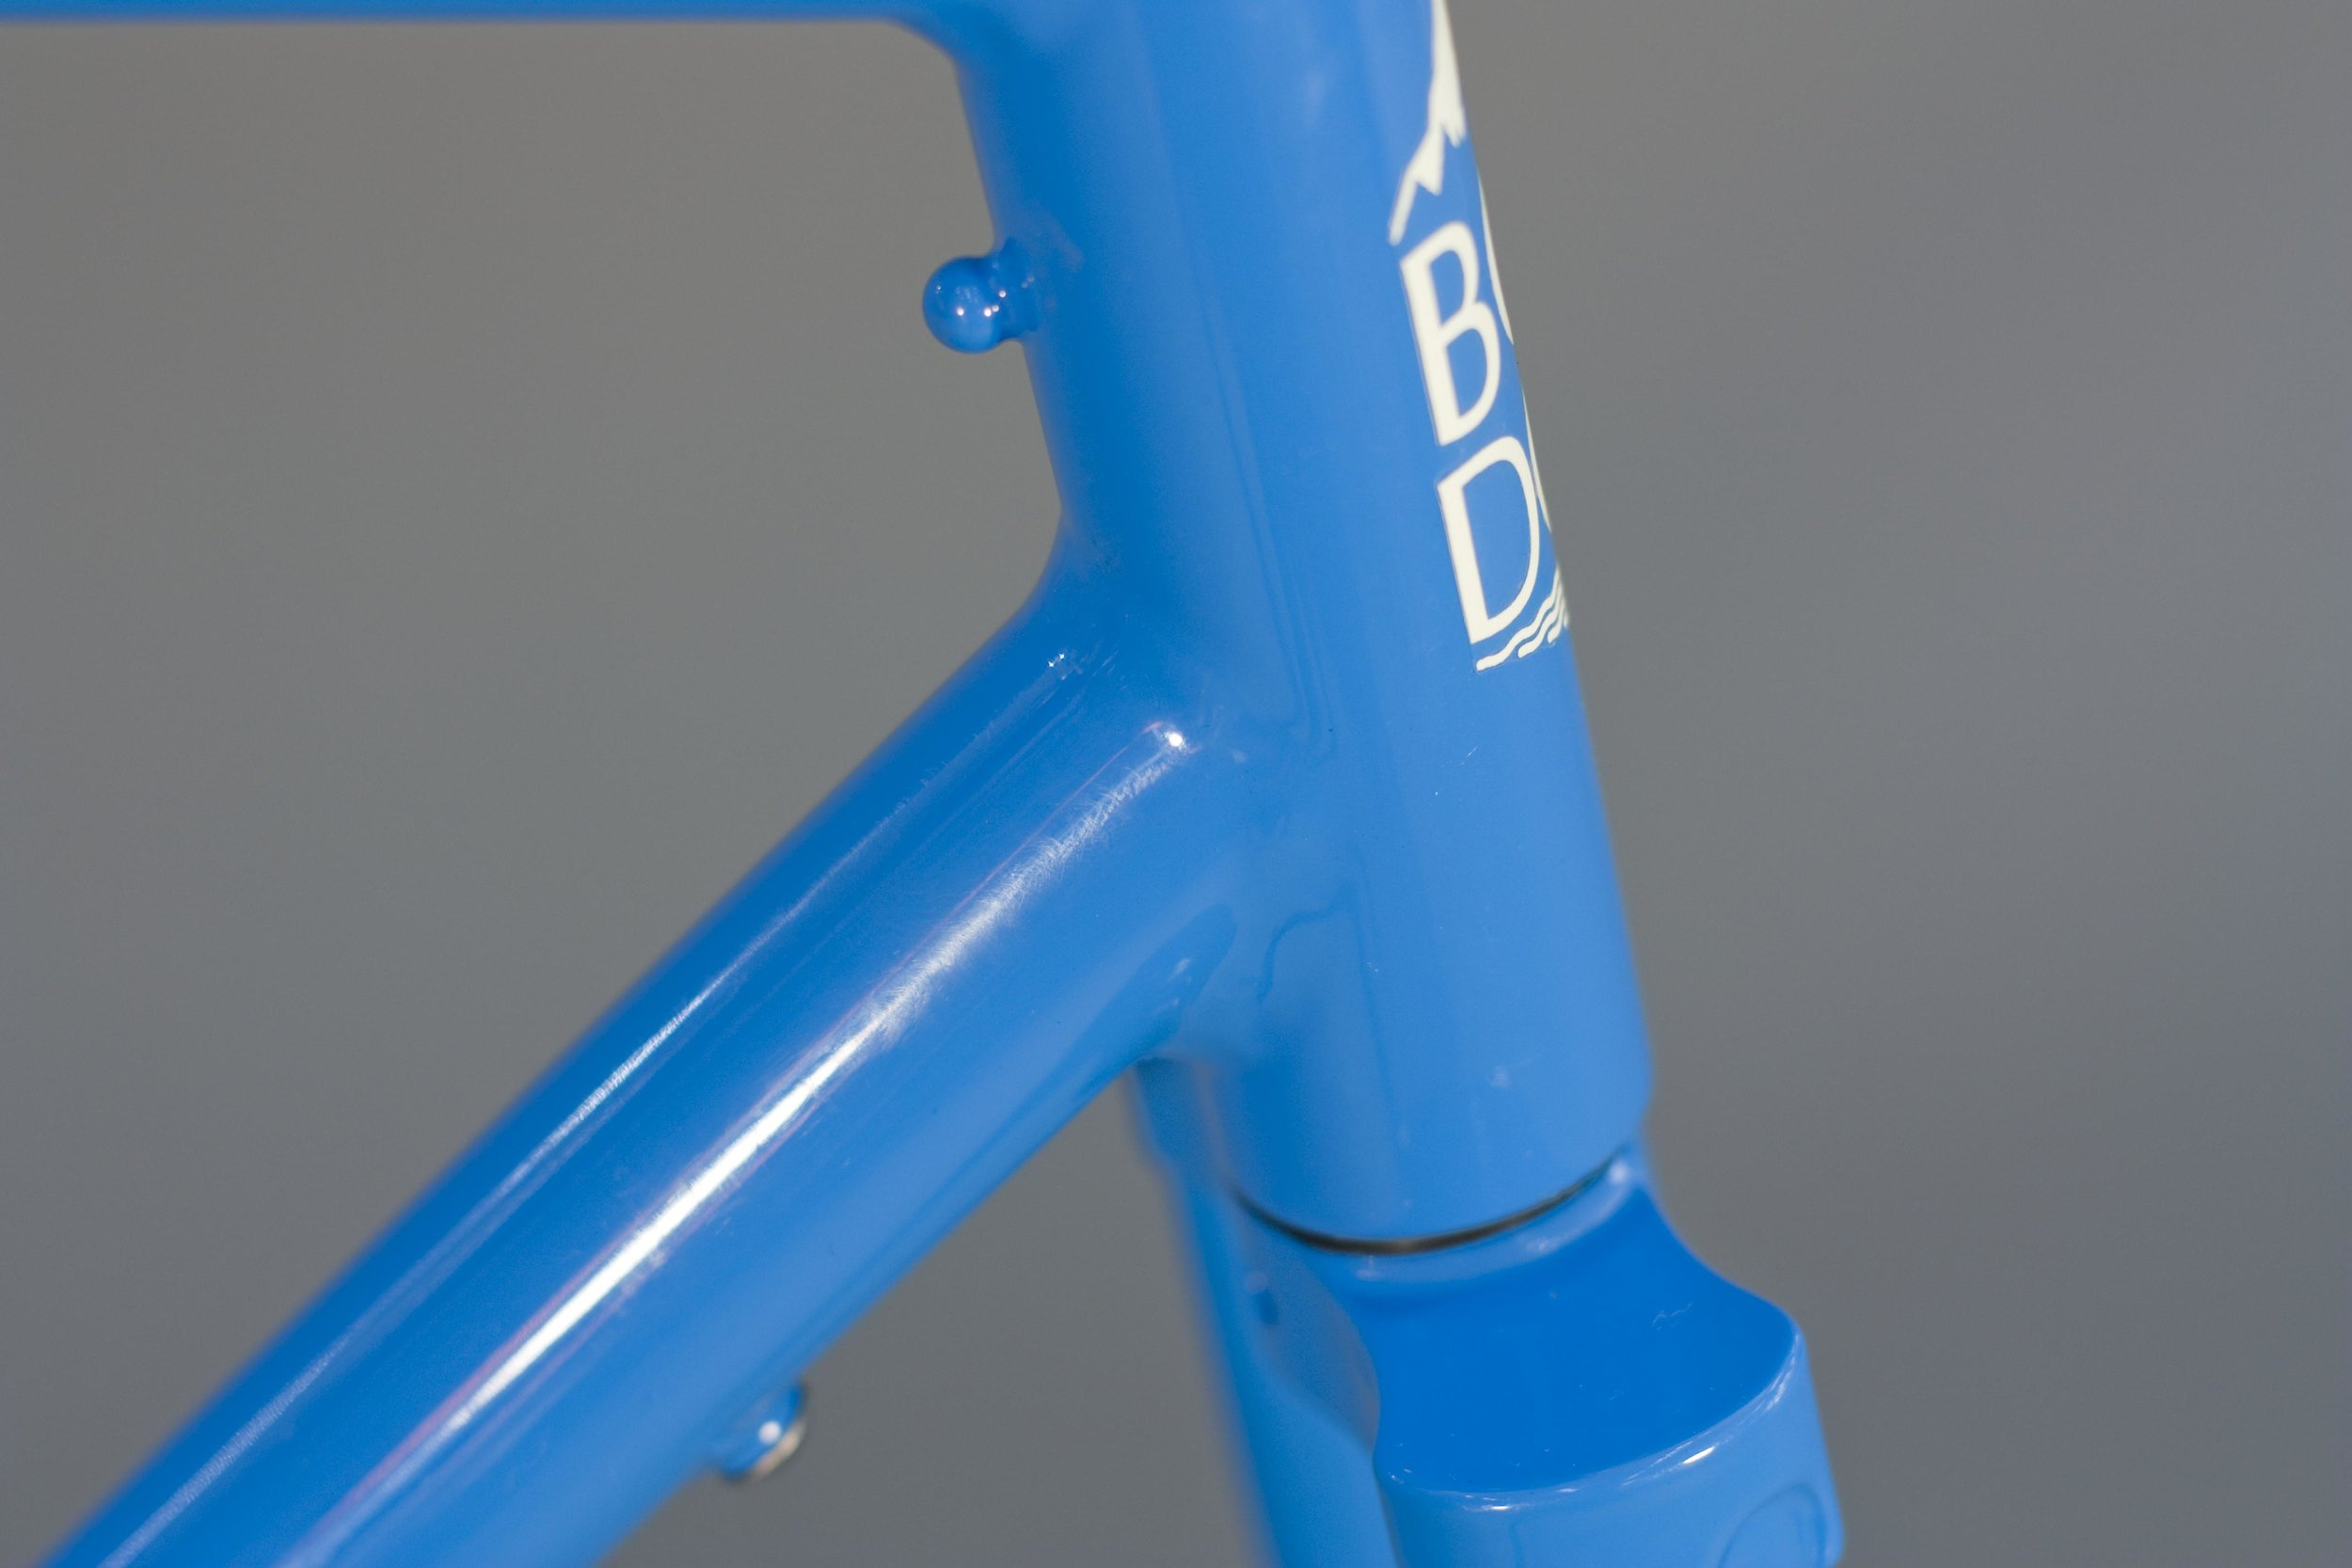 56cm-winter-bicycles-built-pelican_8270939294_o.jpg